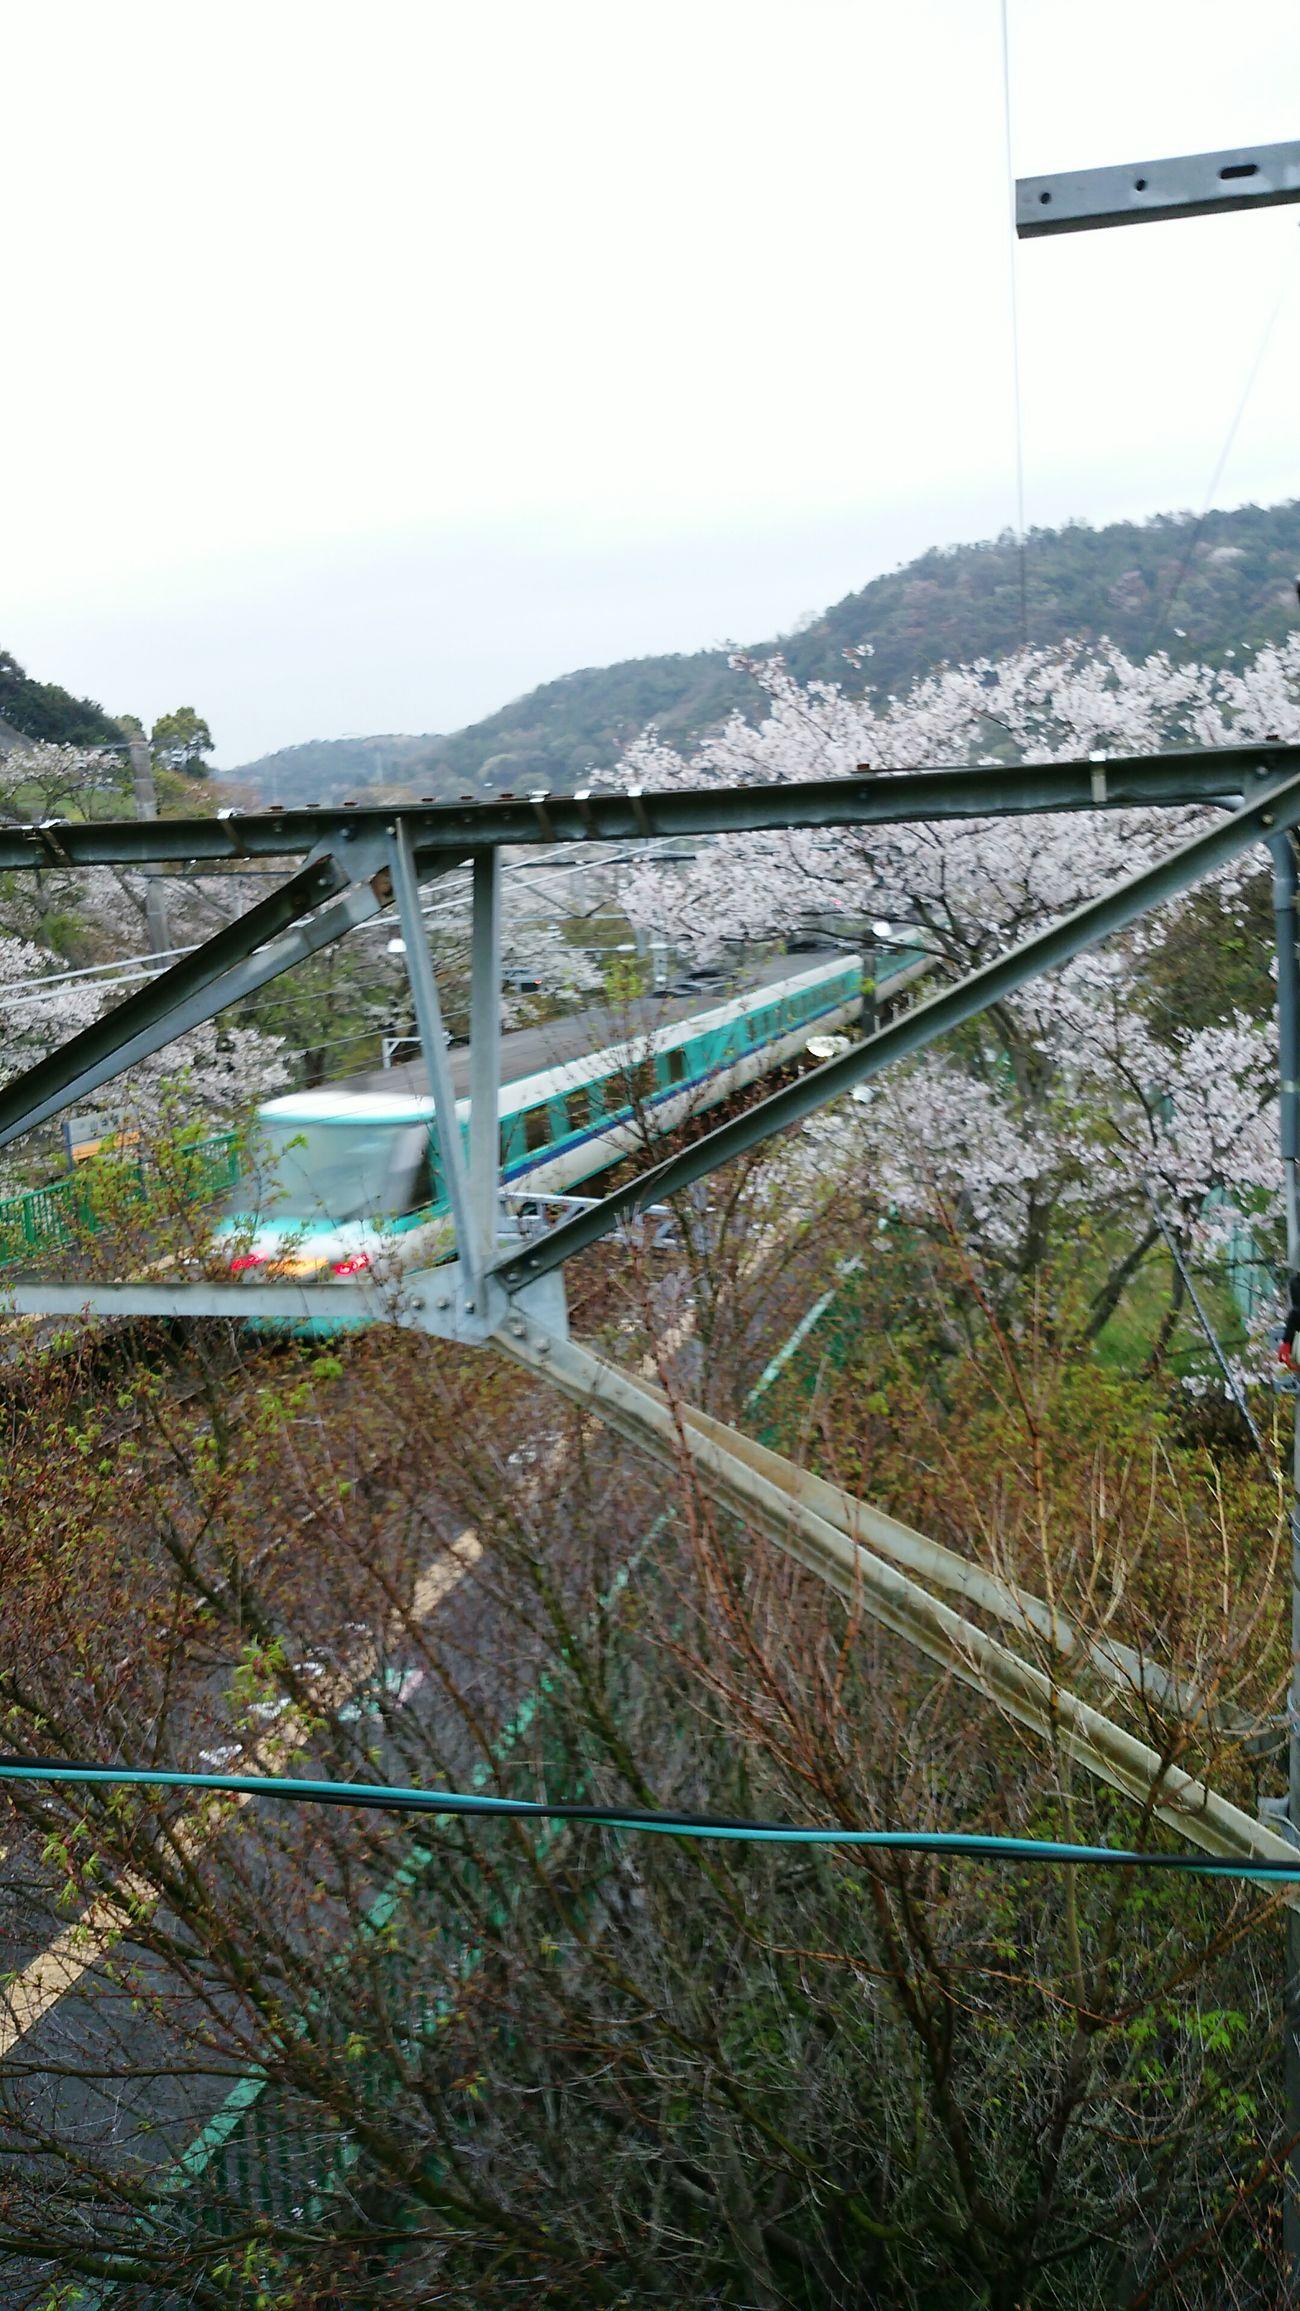 2015-4-4 Hello World Sakura Trees Hanami Charry Flowers Railway Station Public Transportation Osaka Japan Trains Ltd.express Kuroshio Type 381 Ultimate Japan